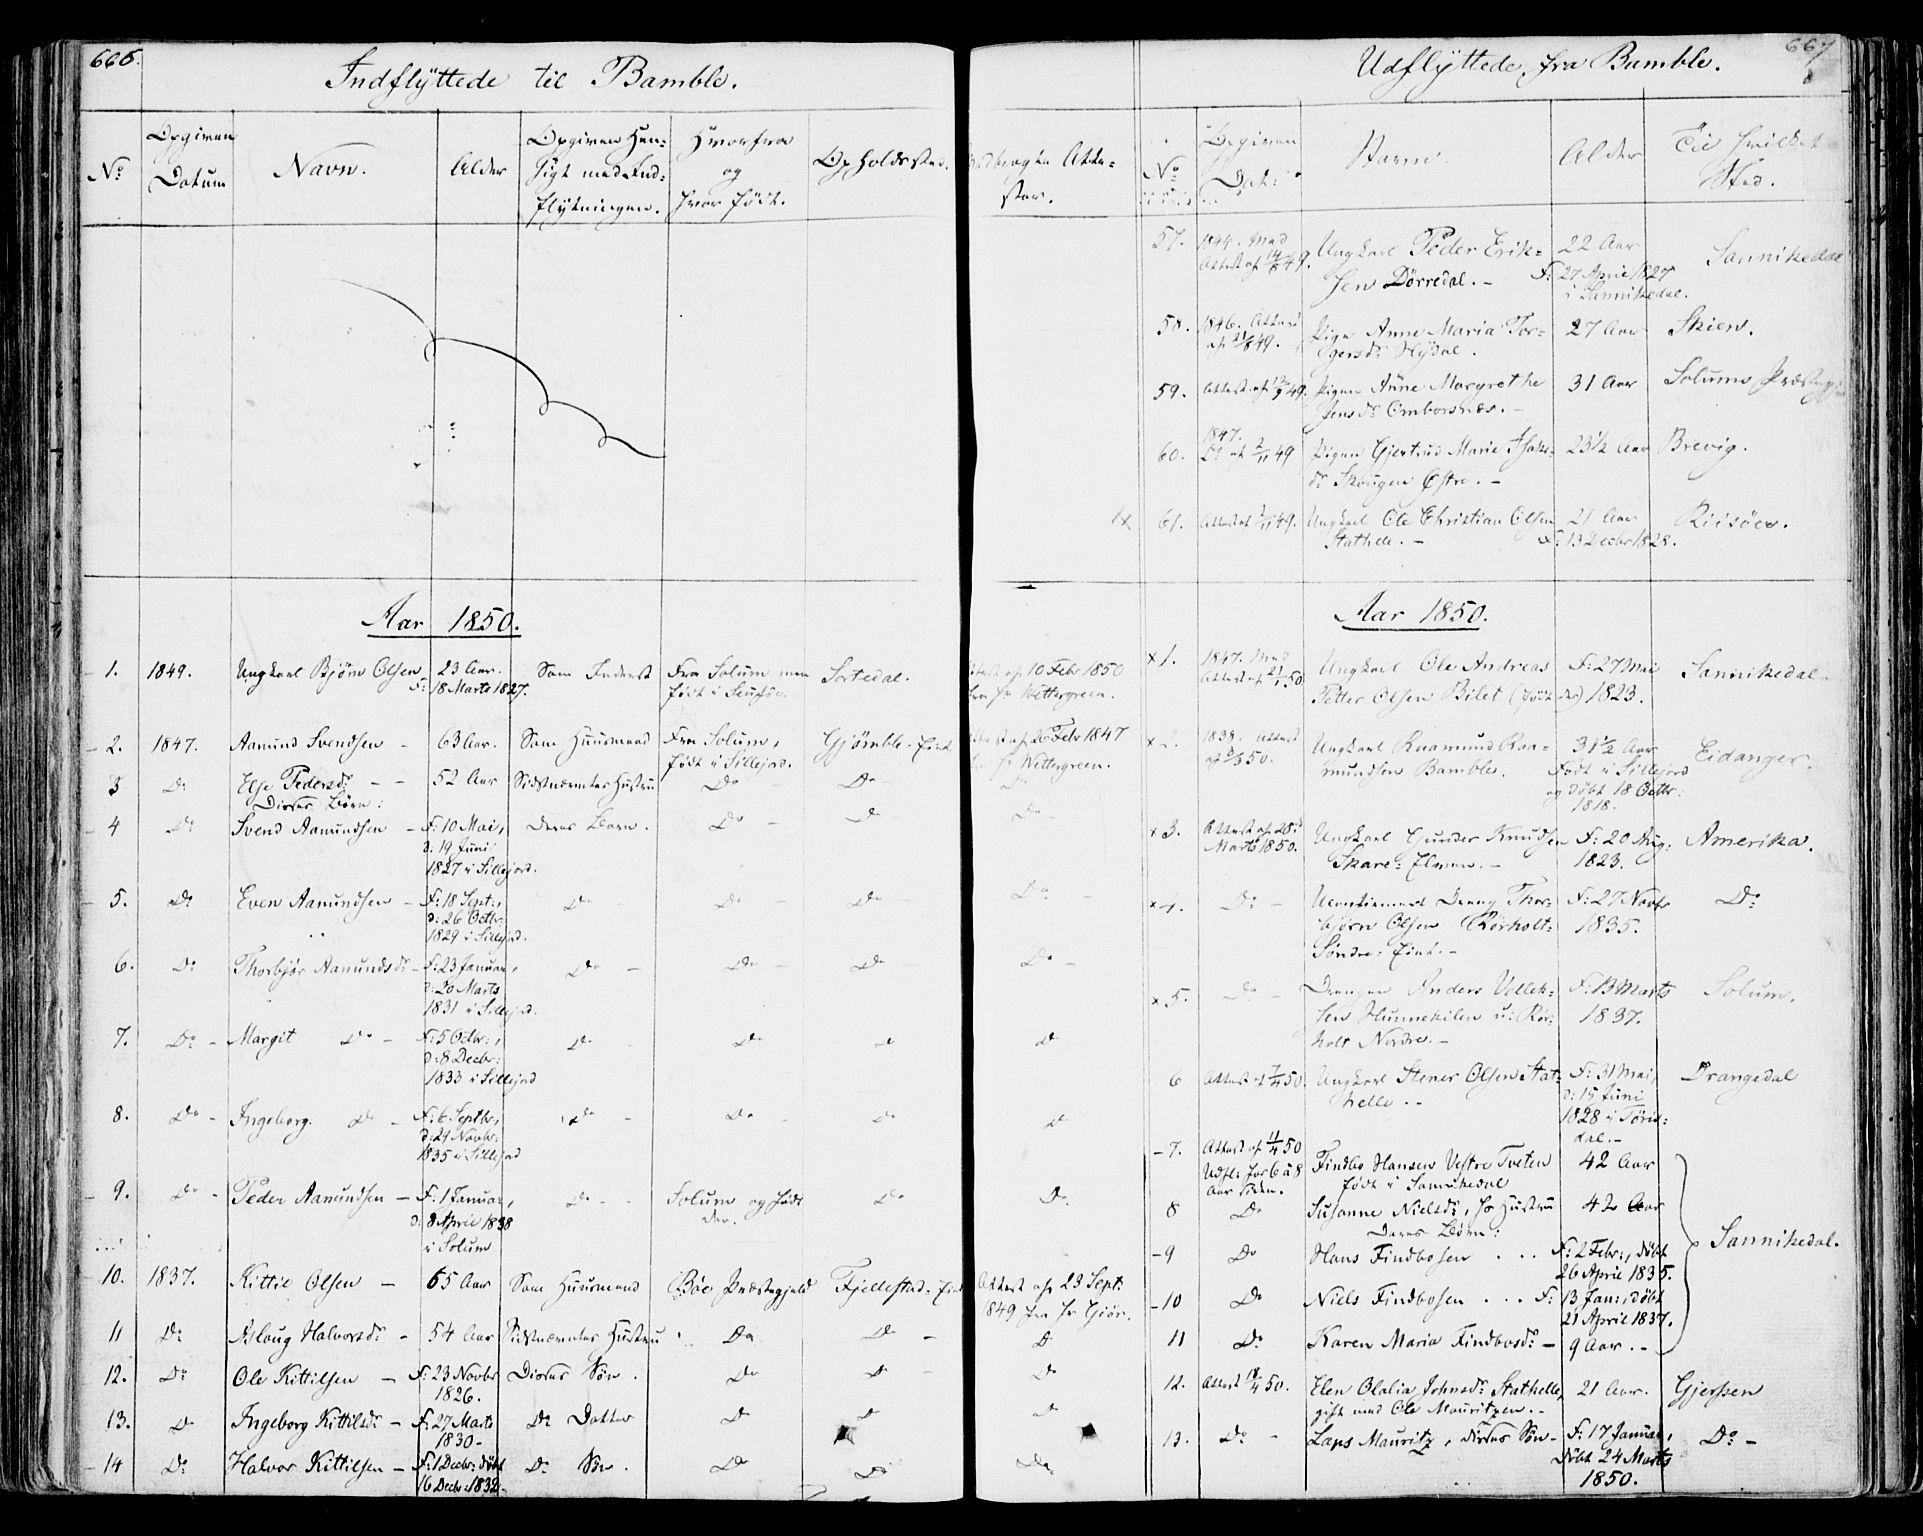 SAKO, Bamble kirkebøker, F/Fa/L0004: Ministerialbok nr. I 4, 1834-1853, s. 666-667